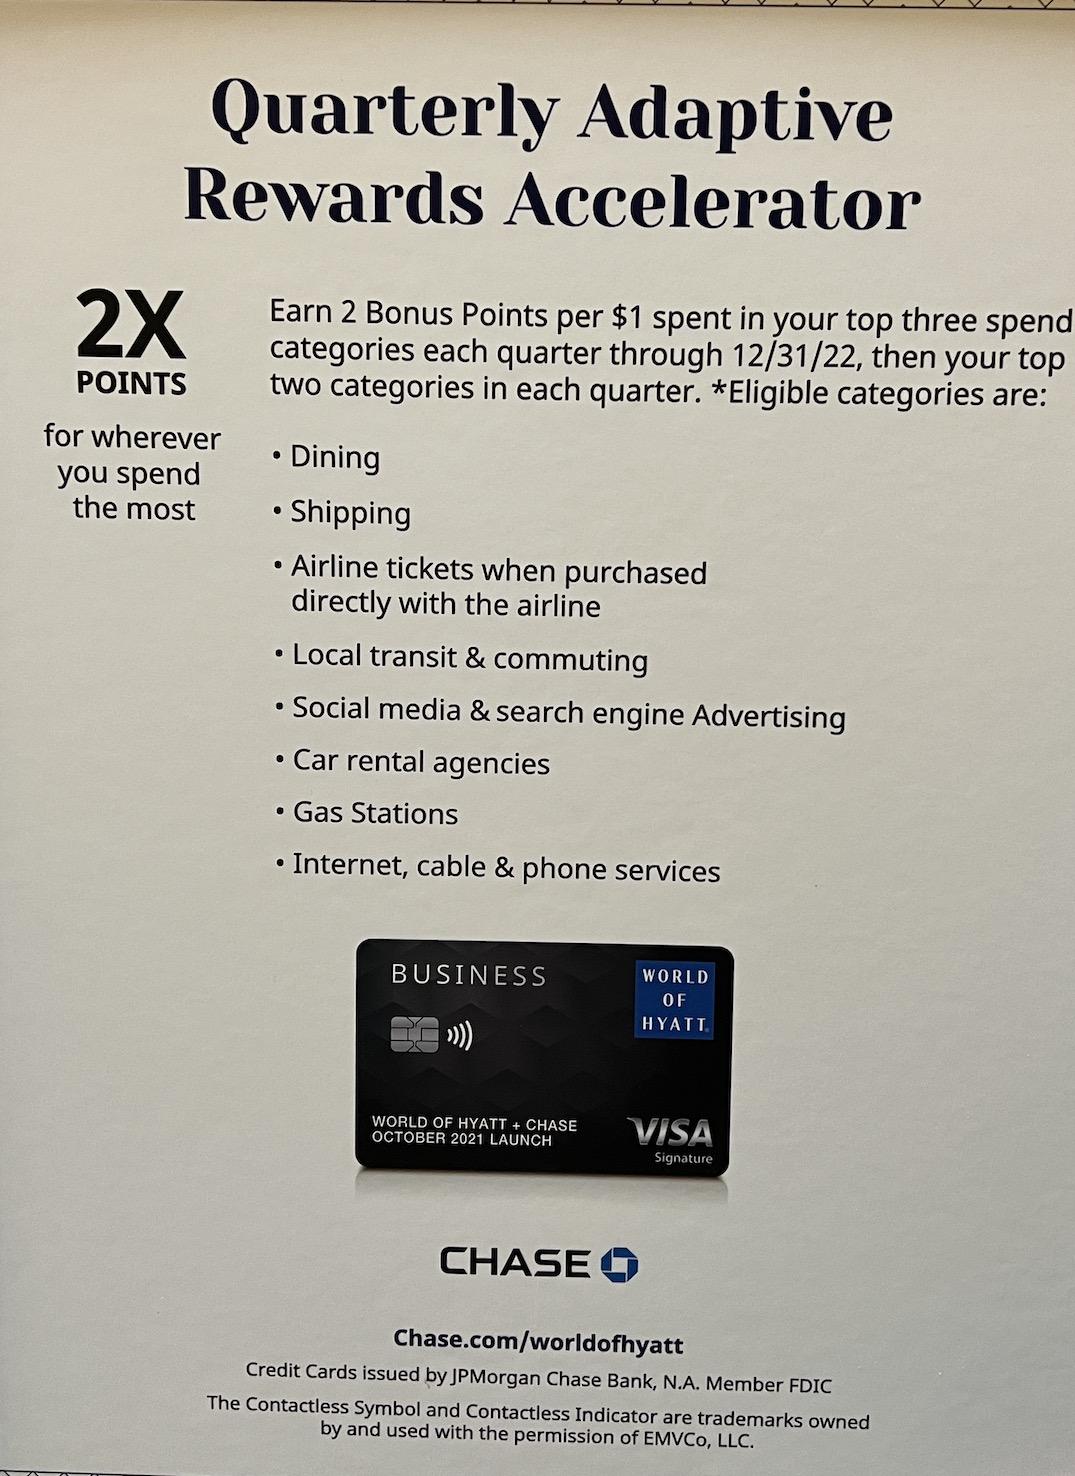 Hyatt business card accelerator